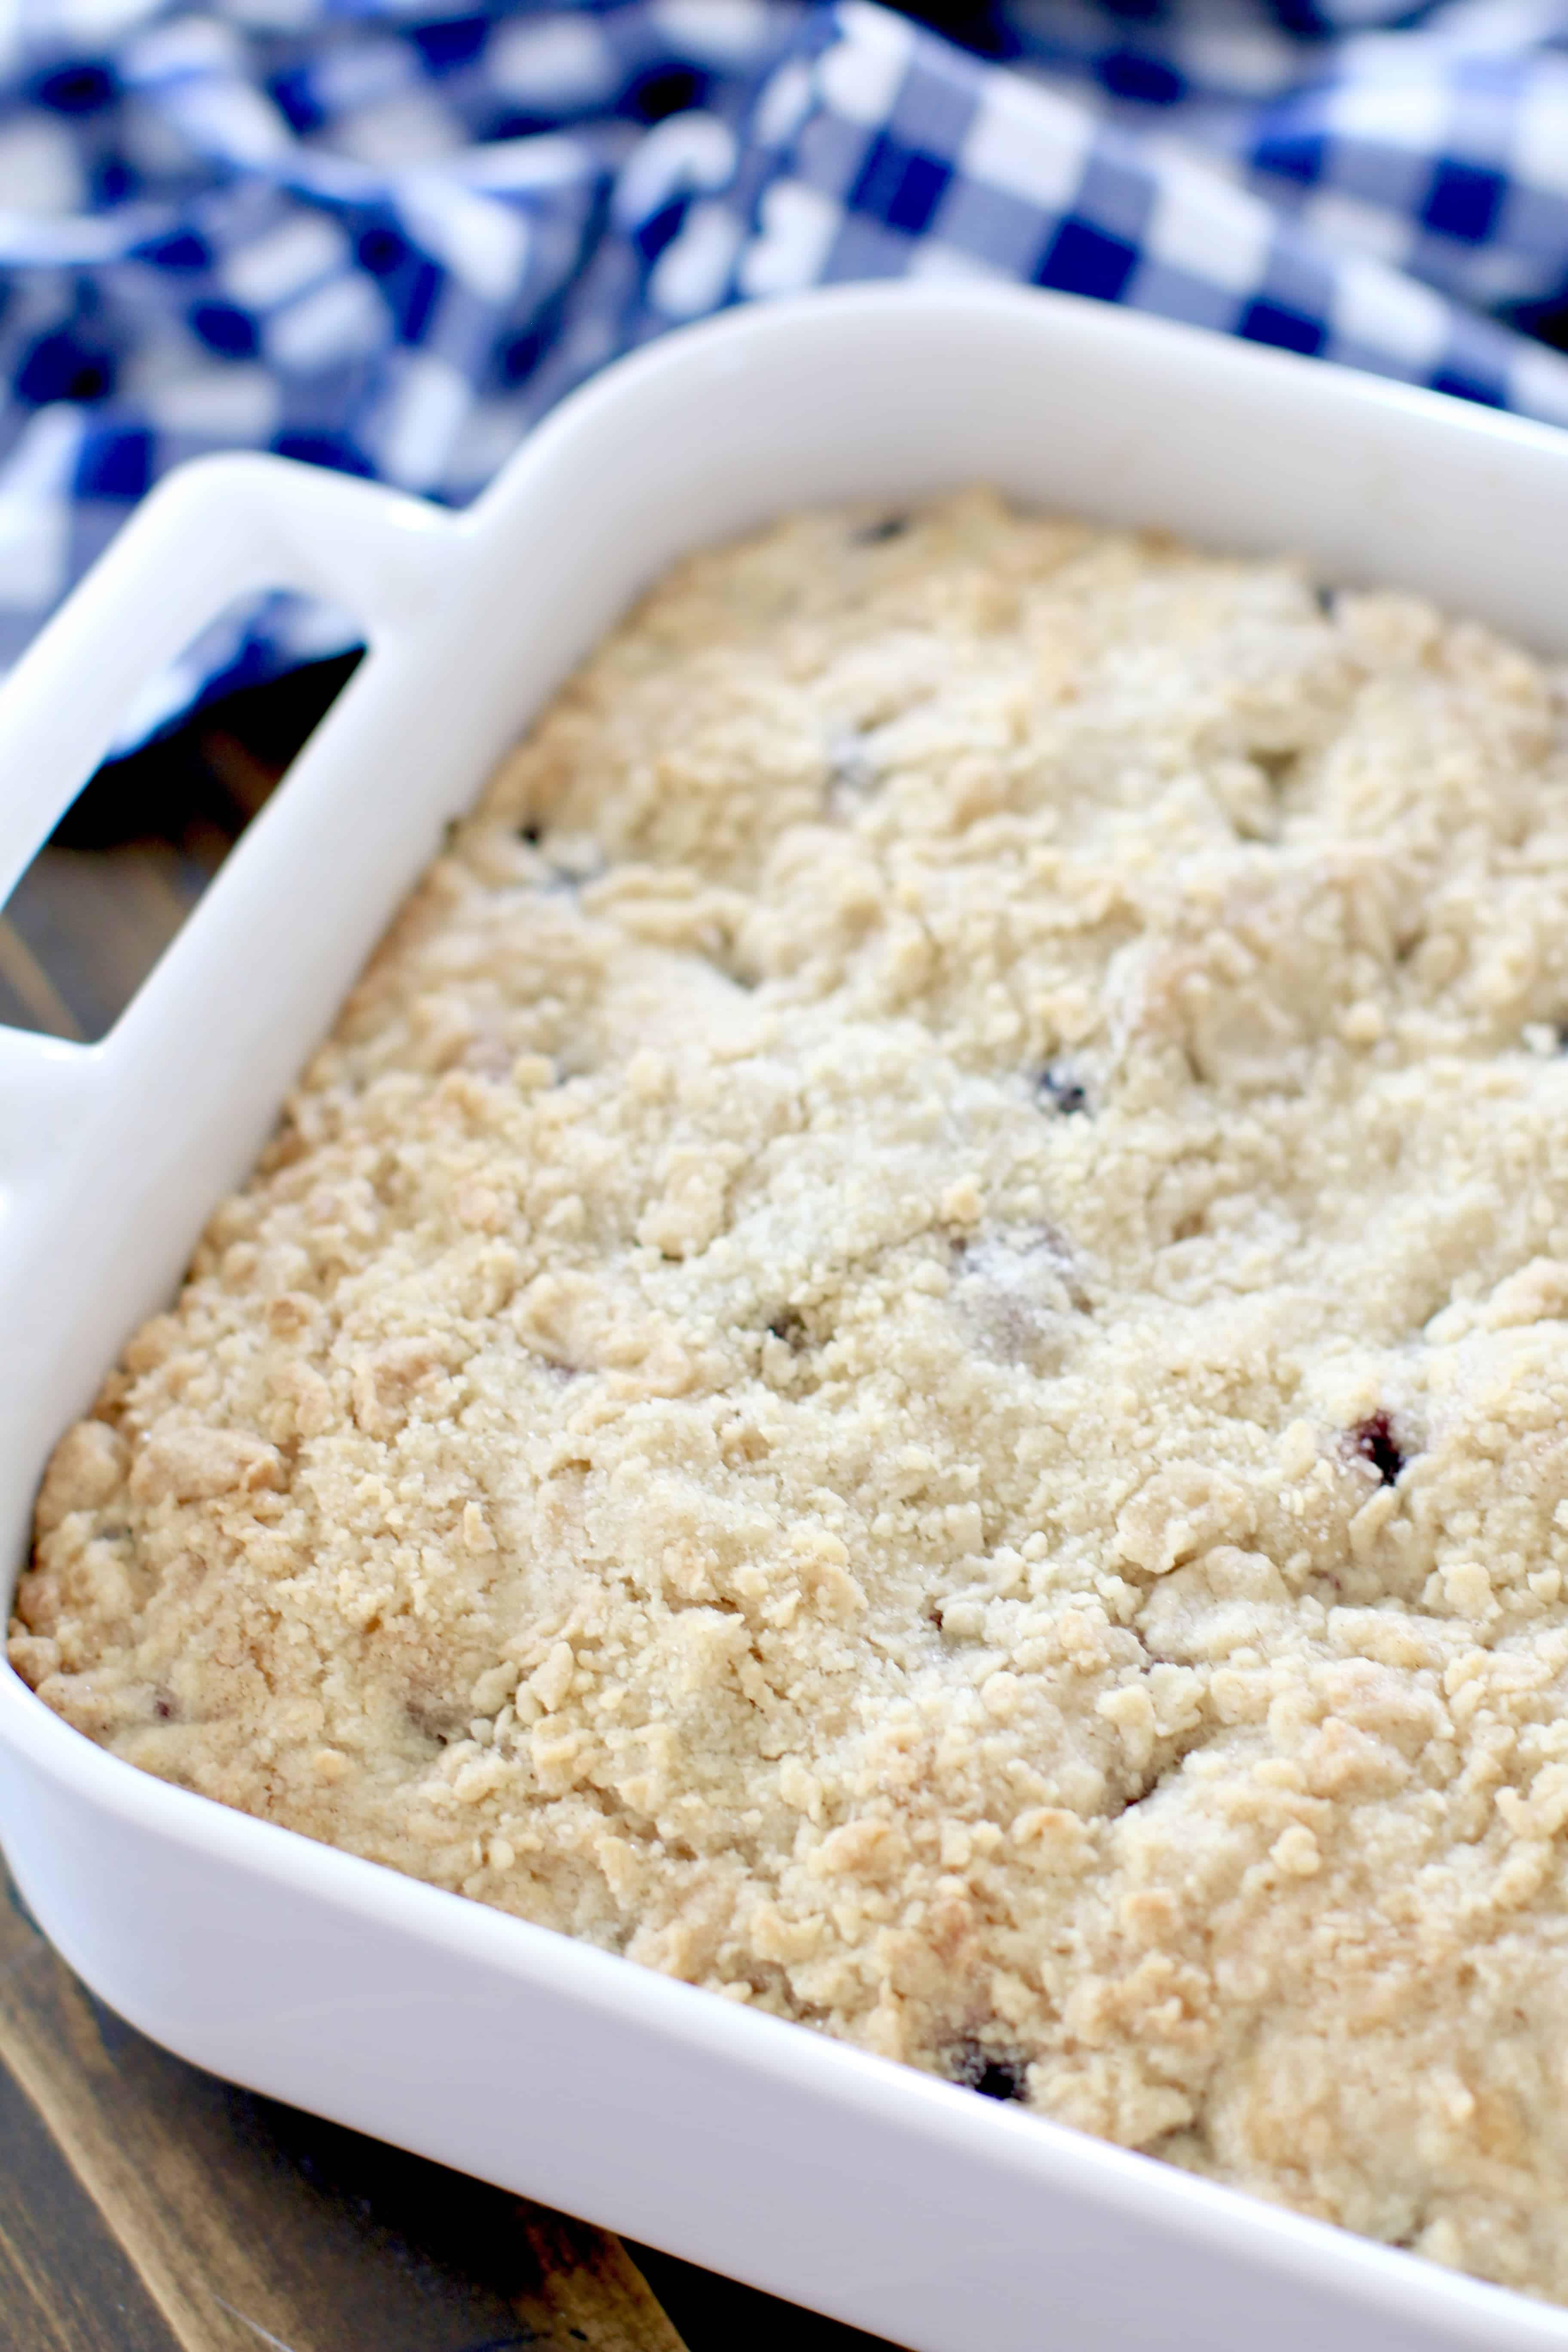 Homemade Blueberry Buckle Cake